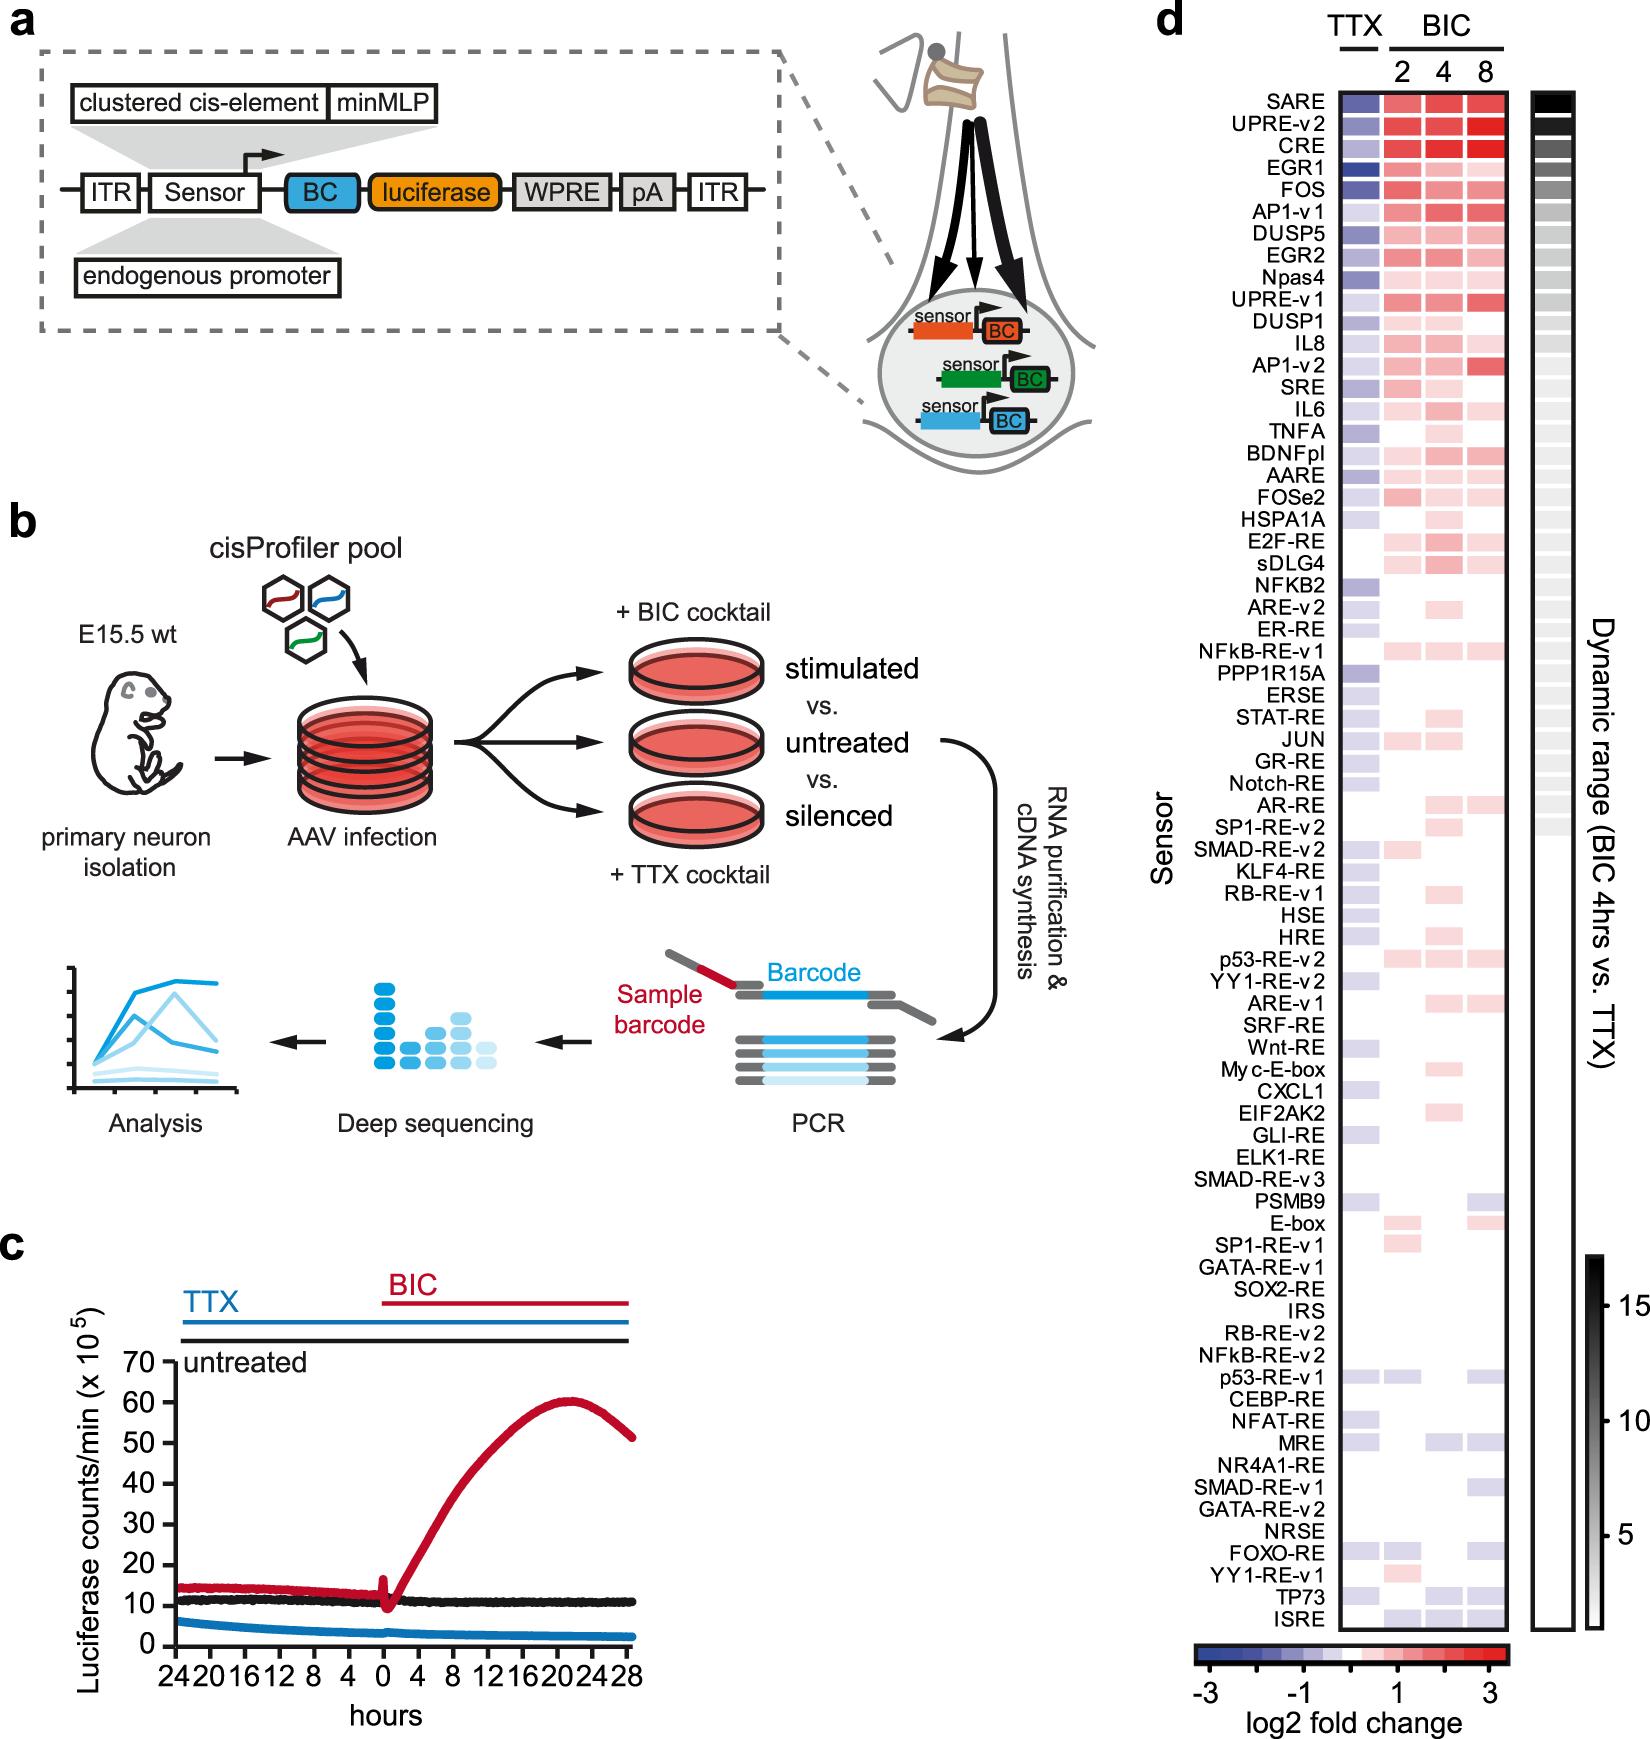 Neuronal Barcodes Shape Complex Networks In The Brain >> Pathway Sensor Based Functional Genomics Screening Identifies